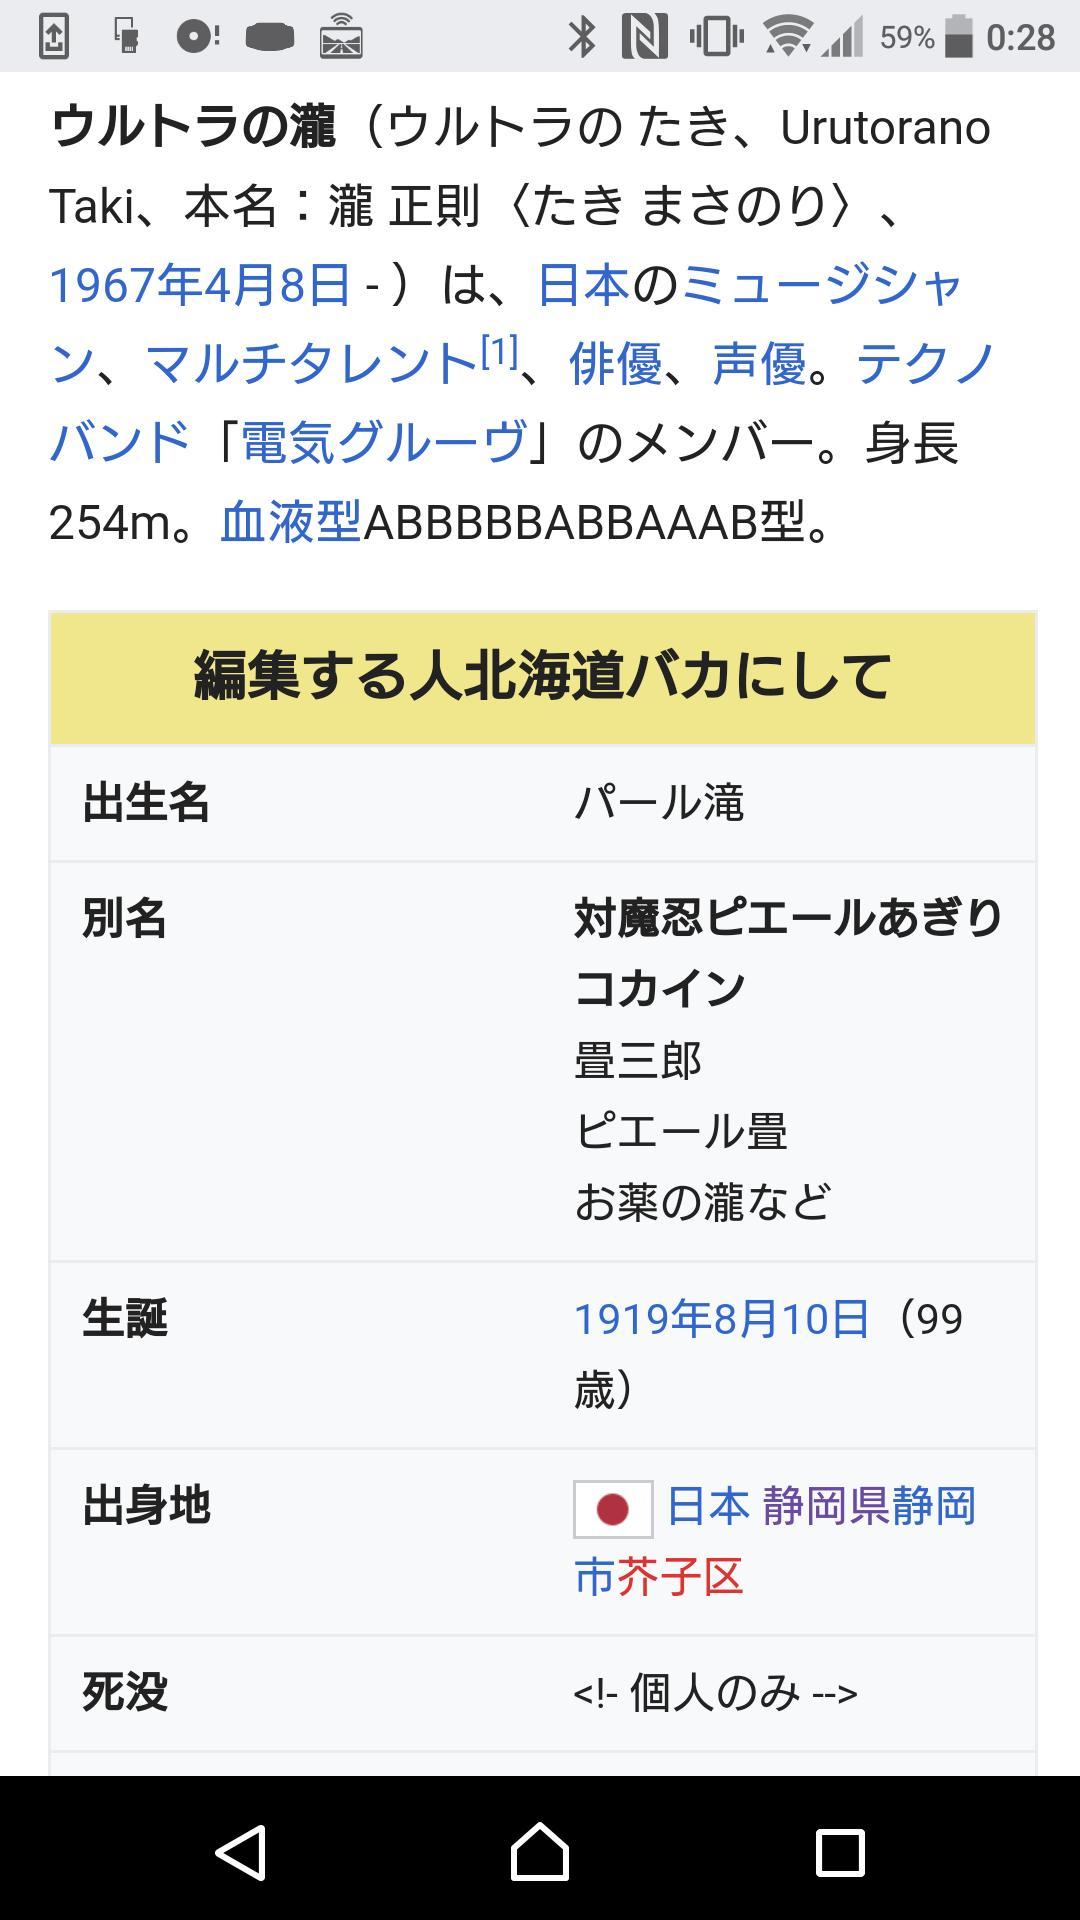 飯塚 幸三 wiki